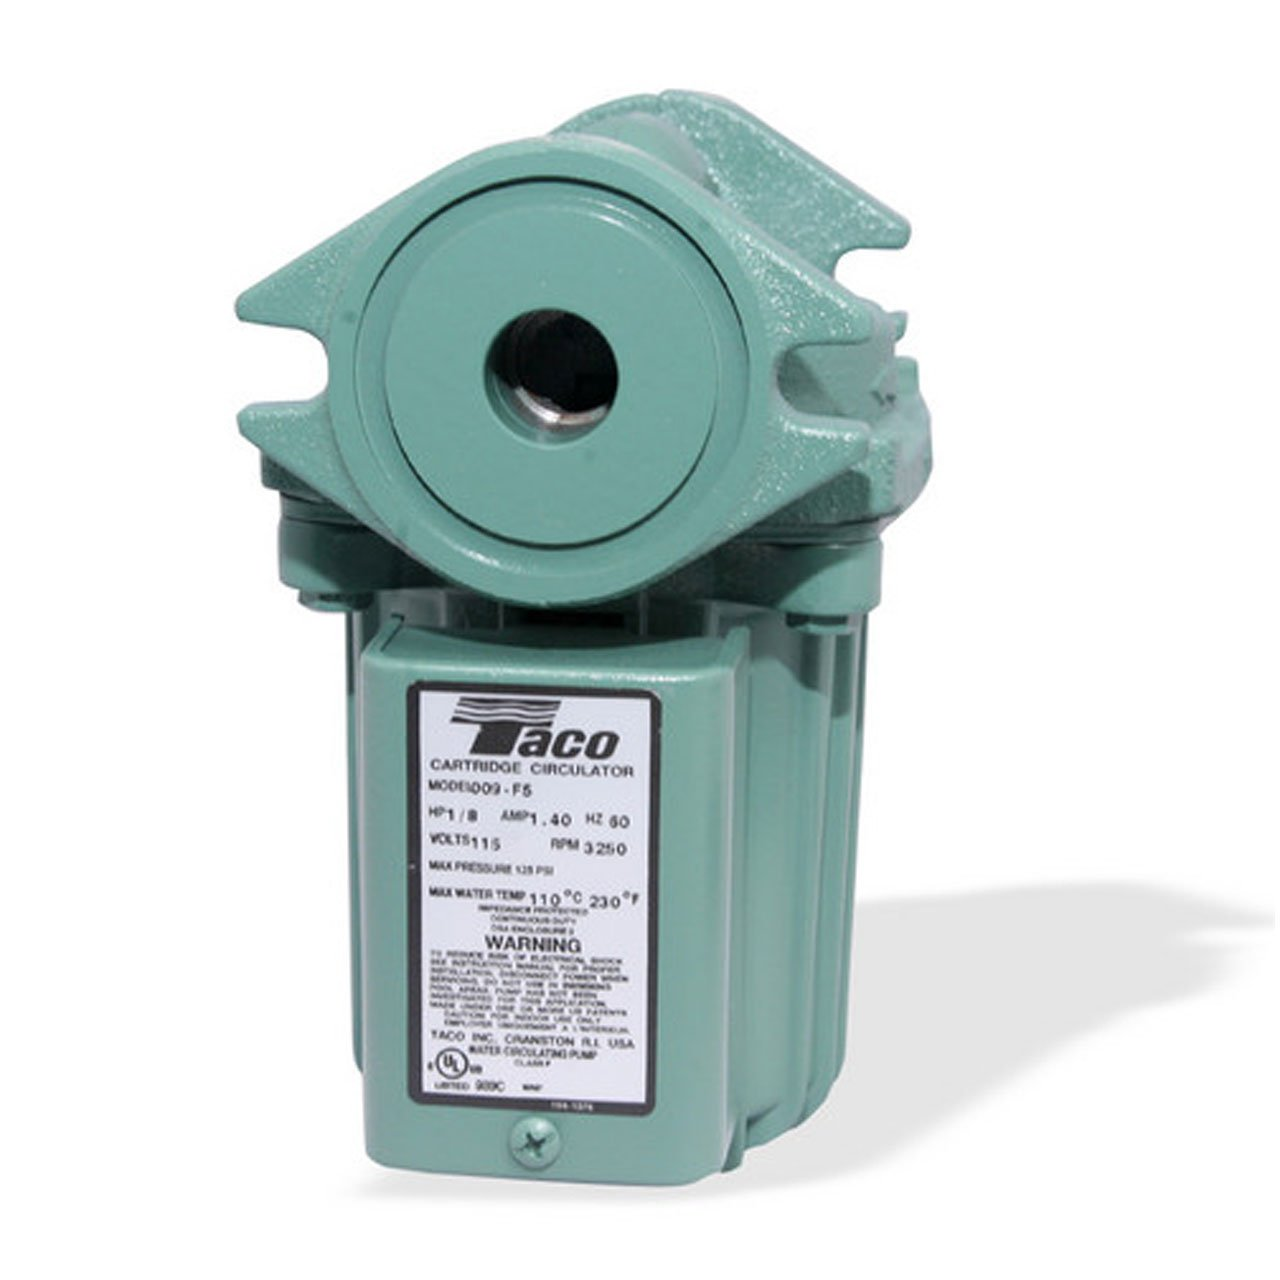 Taco 009-SF5 Stainless Steel Circulator Pump